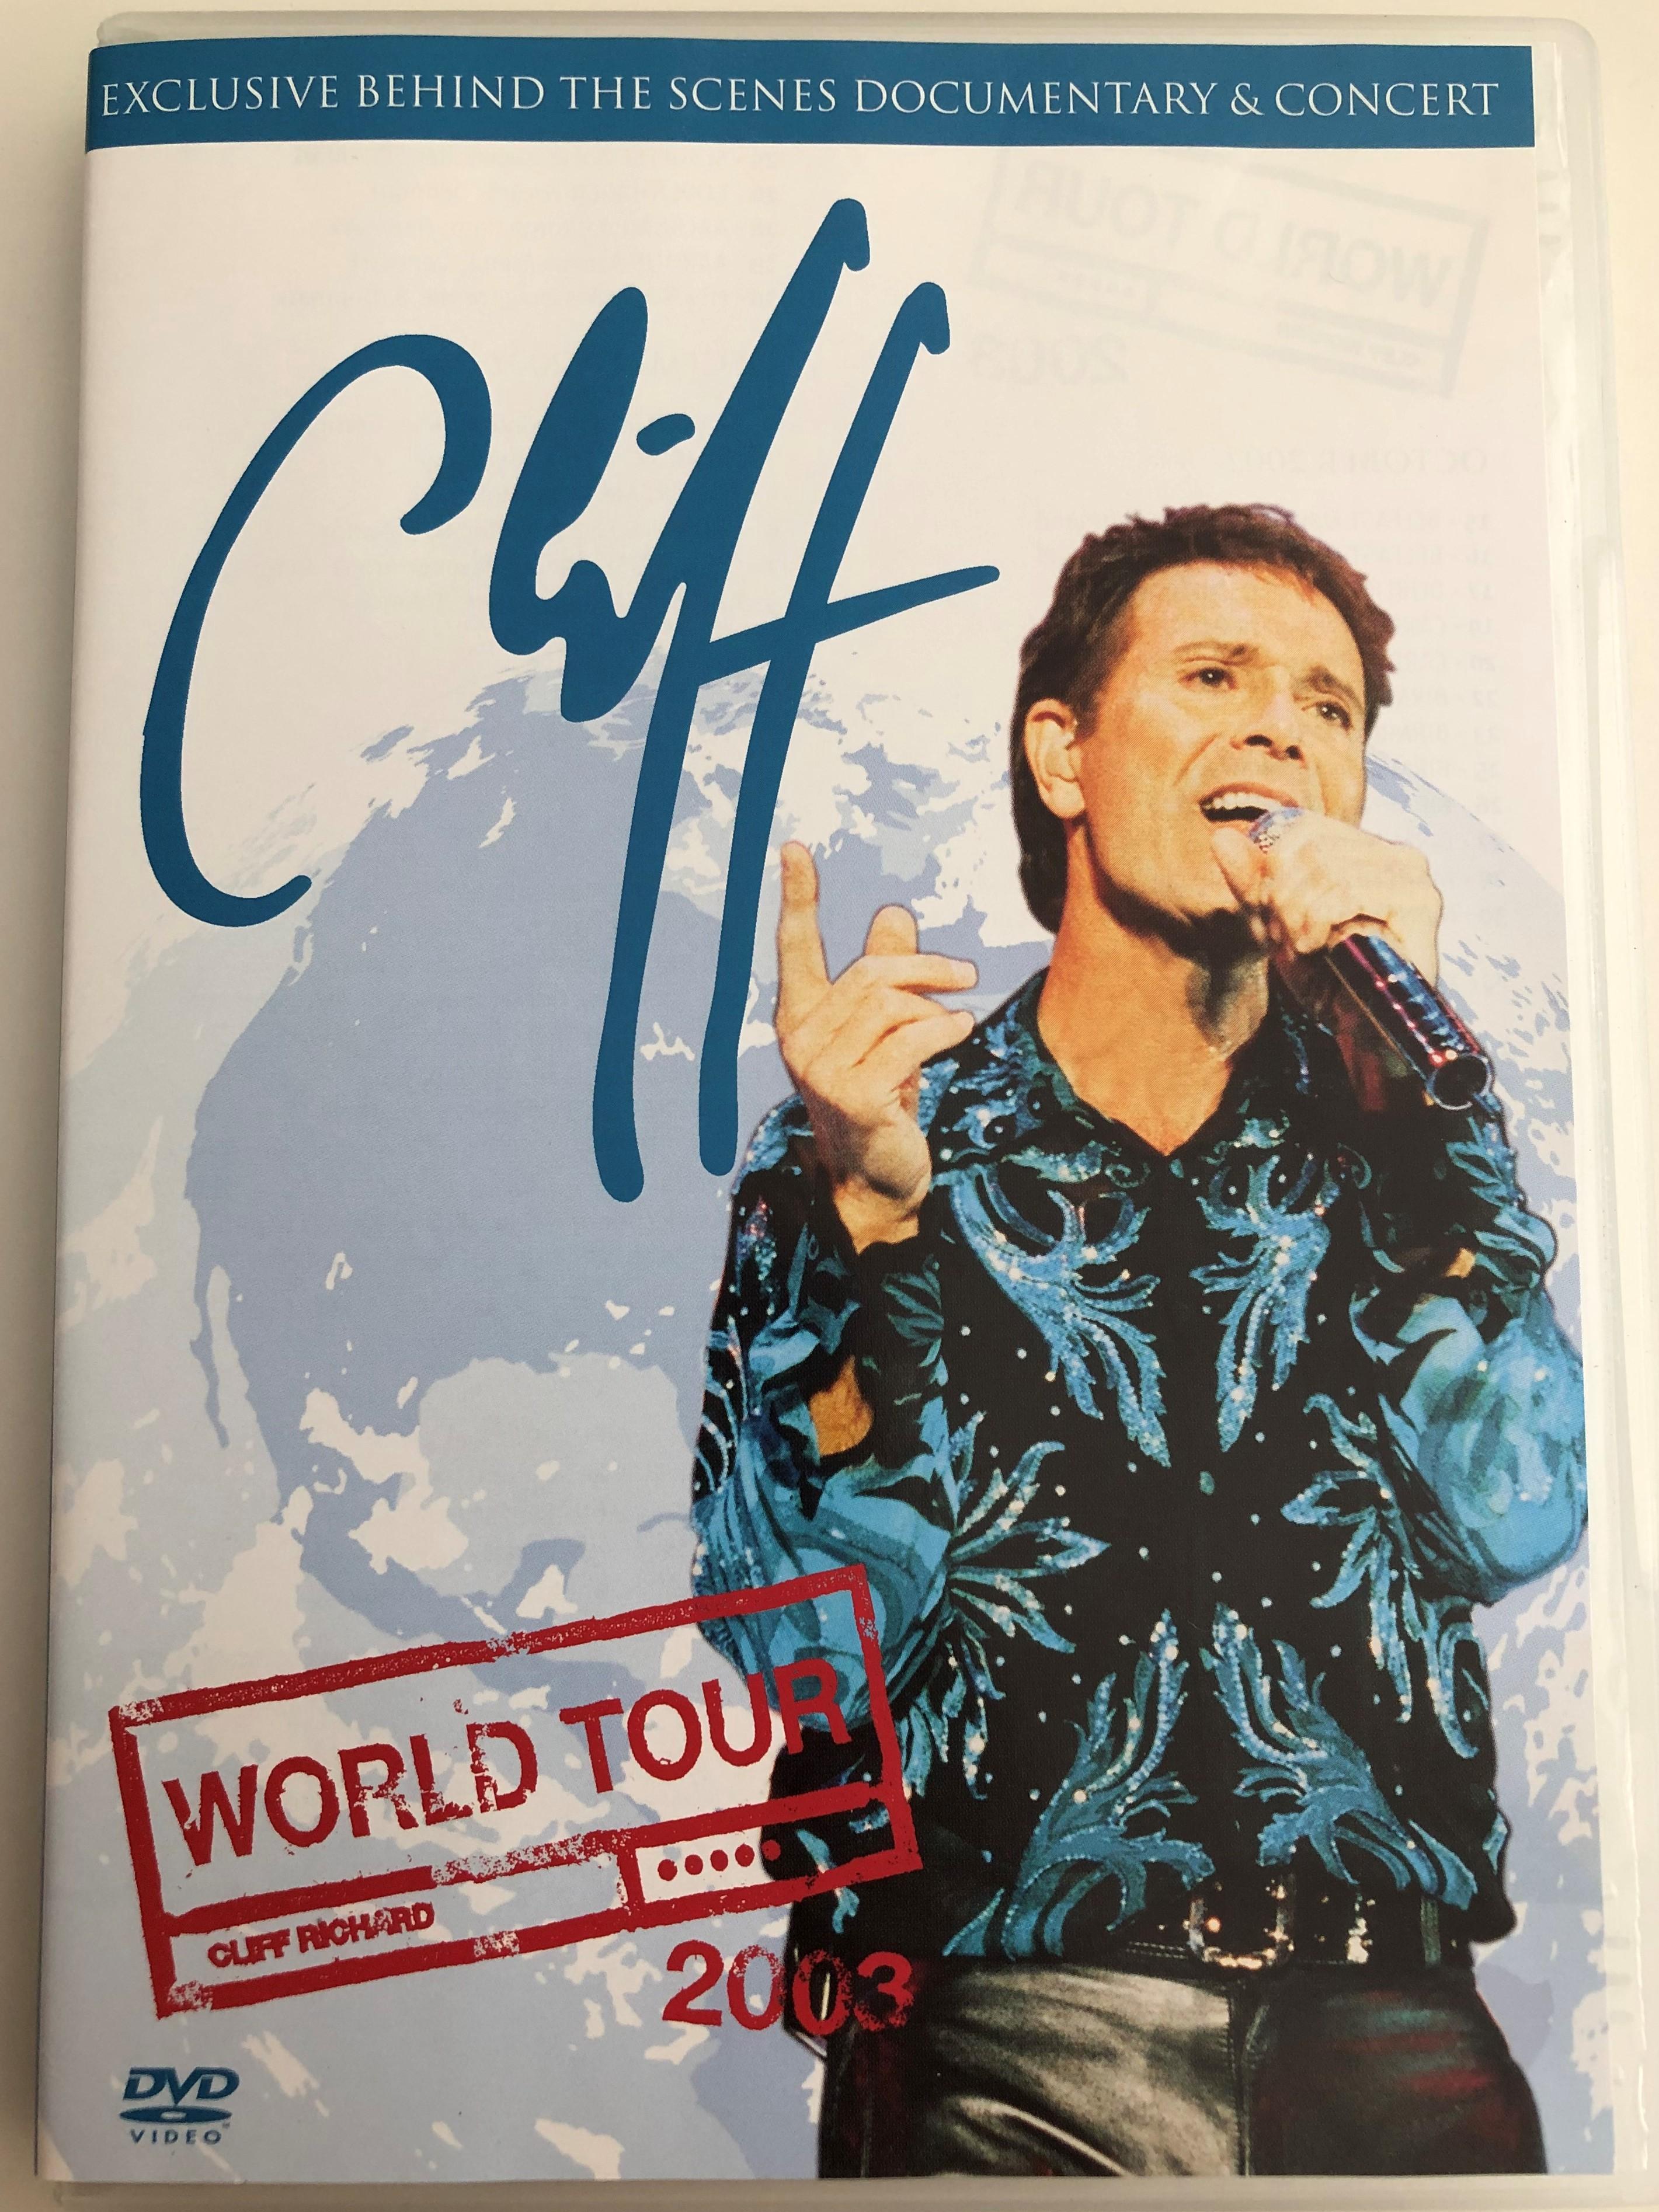 cliff-richard-2003-world-tour-dvd-2004-concert-director-ian-hamilton-1-.jpg